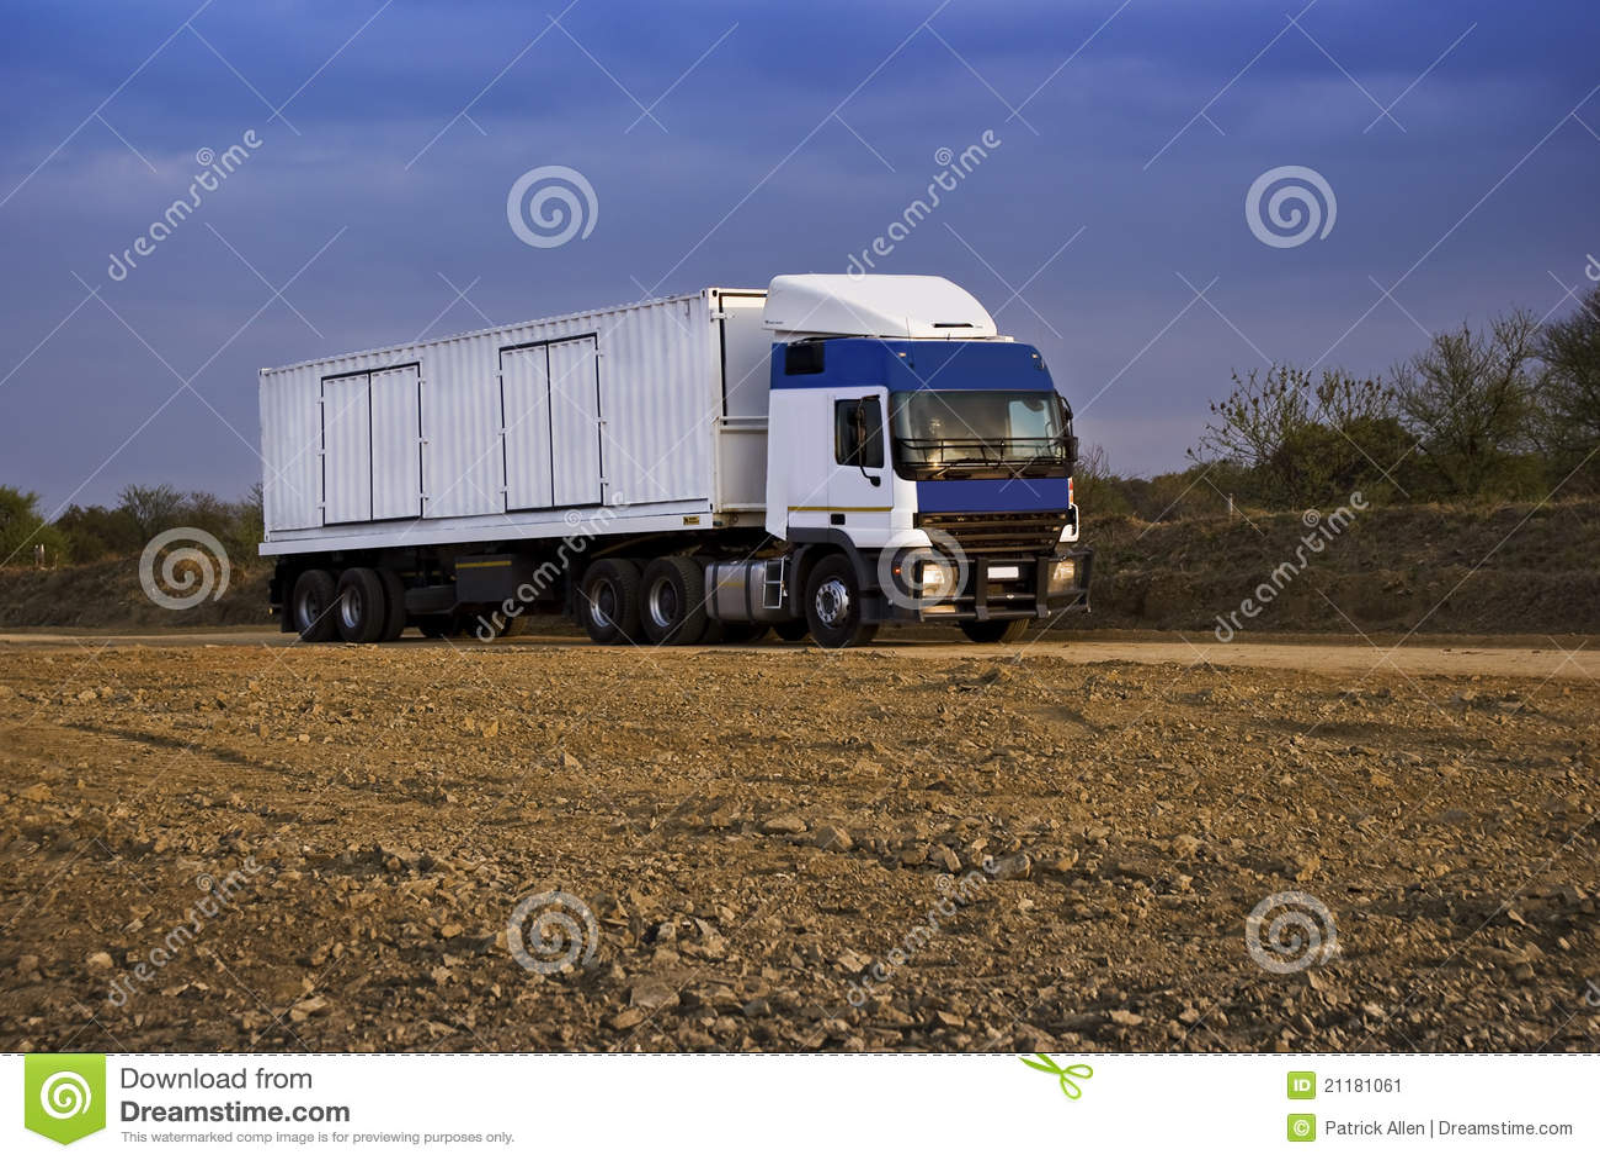 Heavy Goods in Transit via Dirt Roads